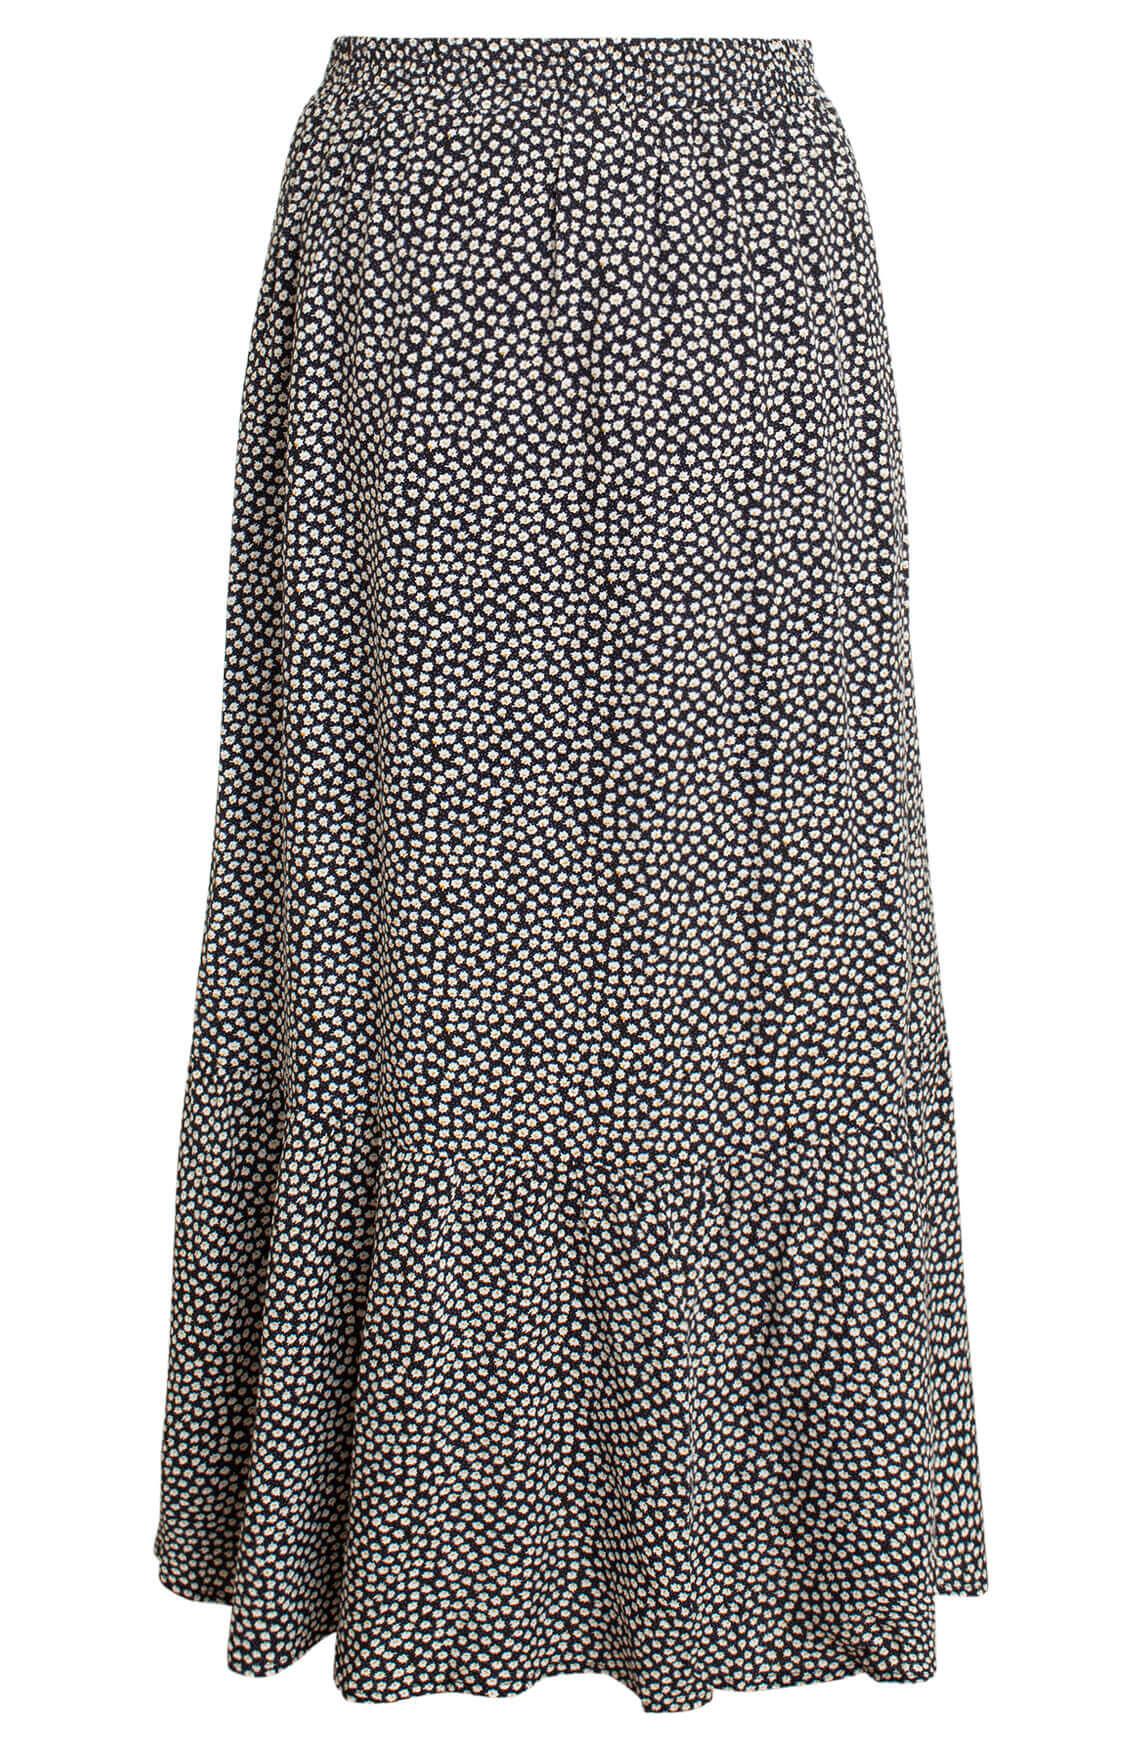 Co Couture Dames Medusa lange rok zwart